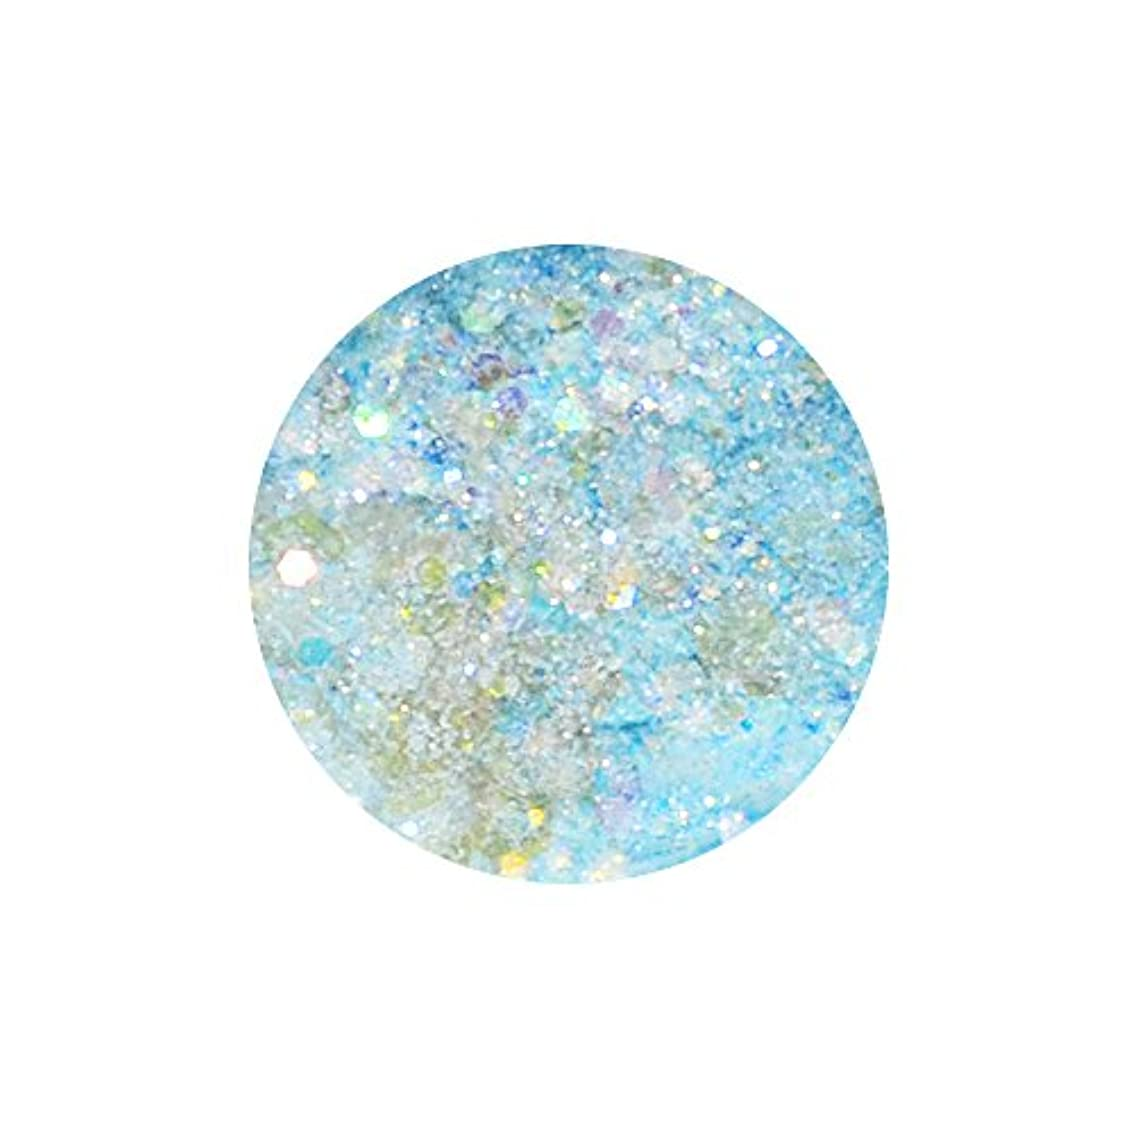 irogel イロジェル 超微粒子マジカルグリッター + ホログラム 【アクアブルーMIX】